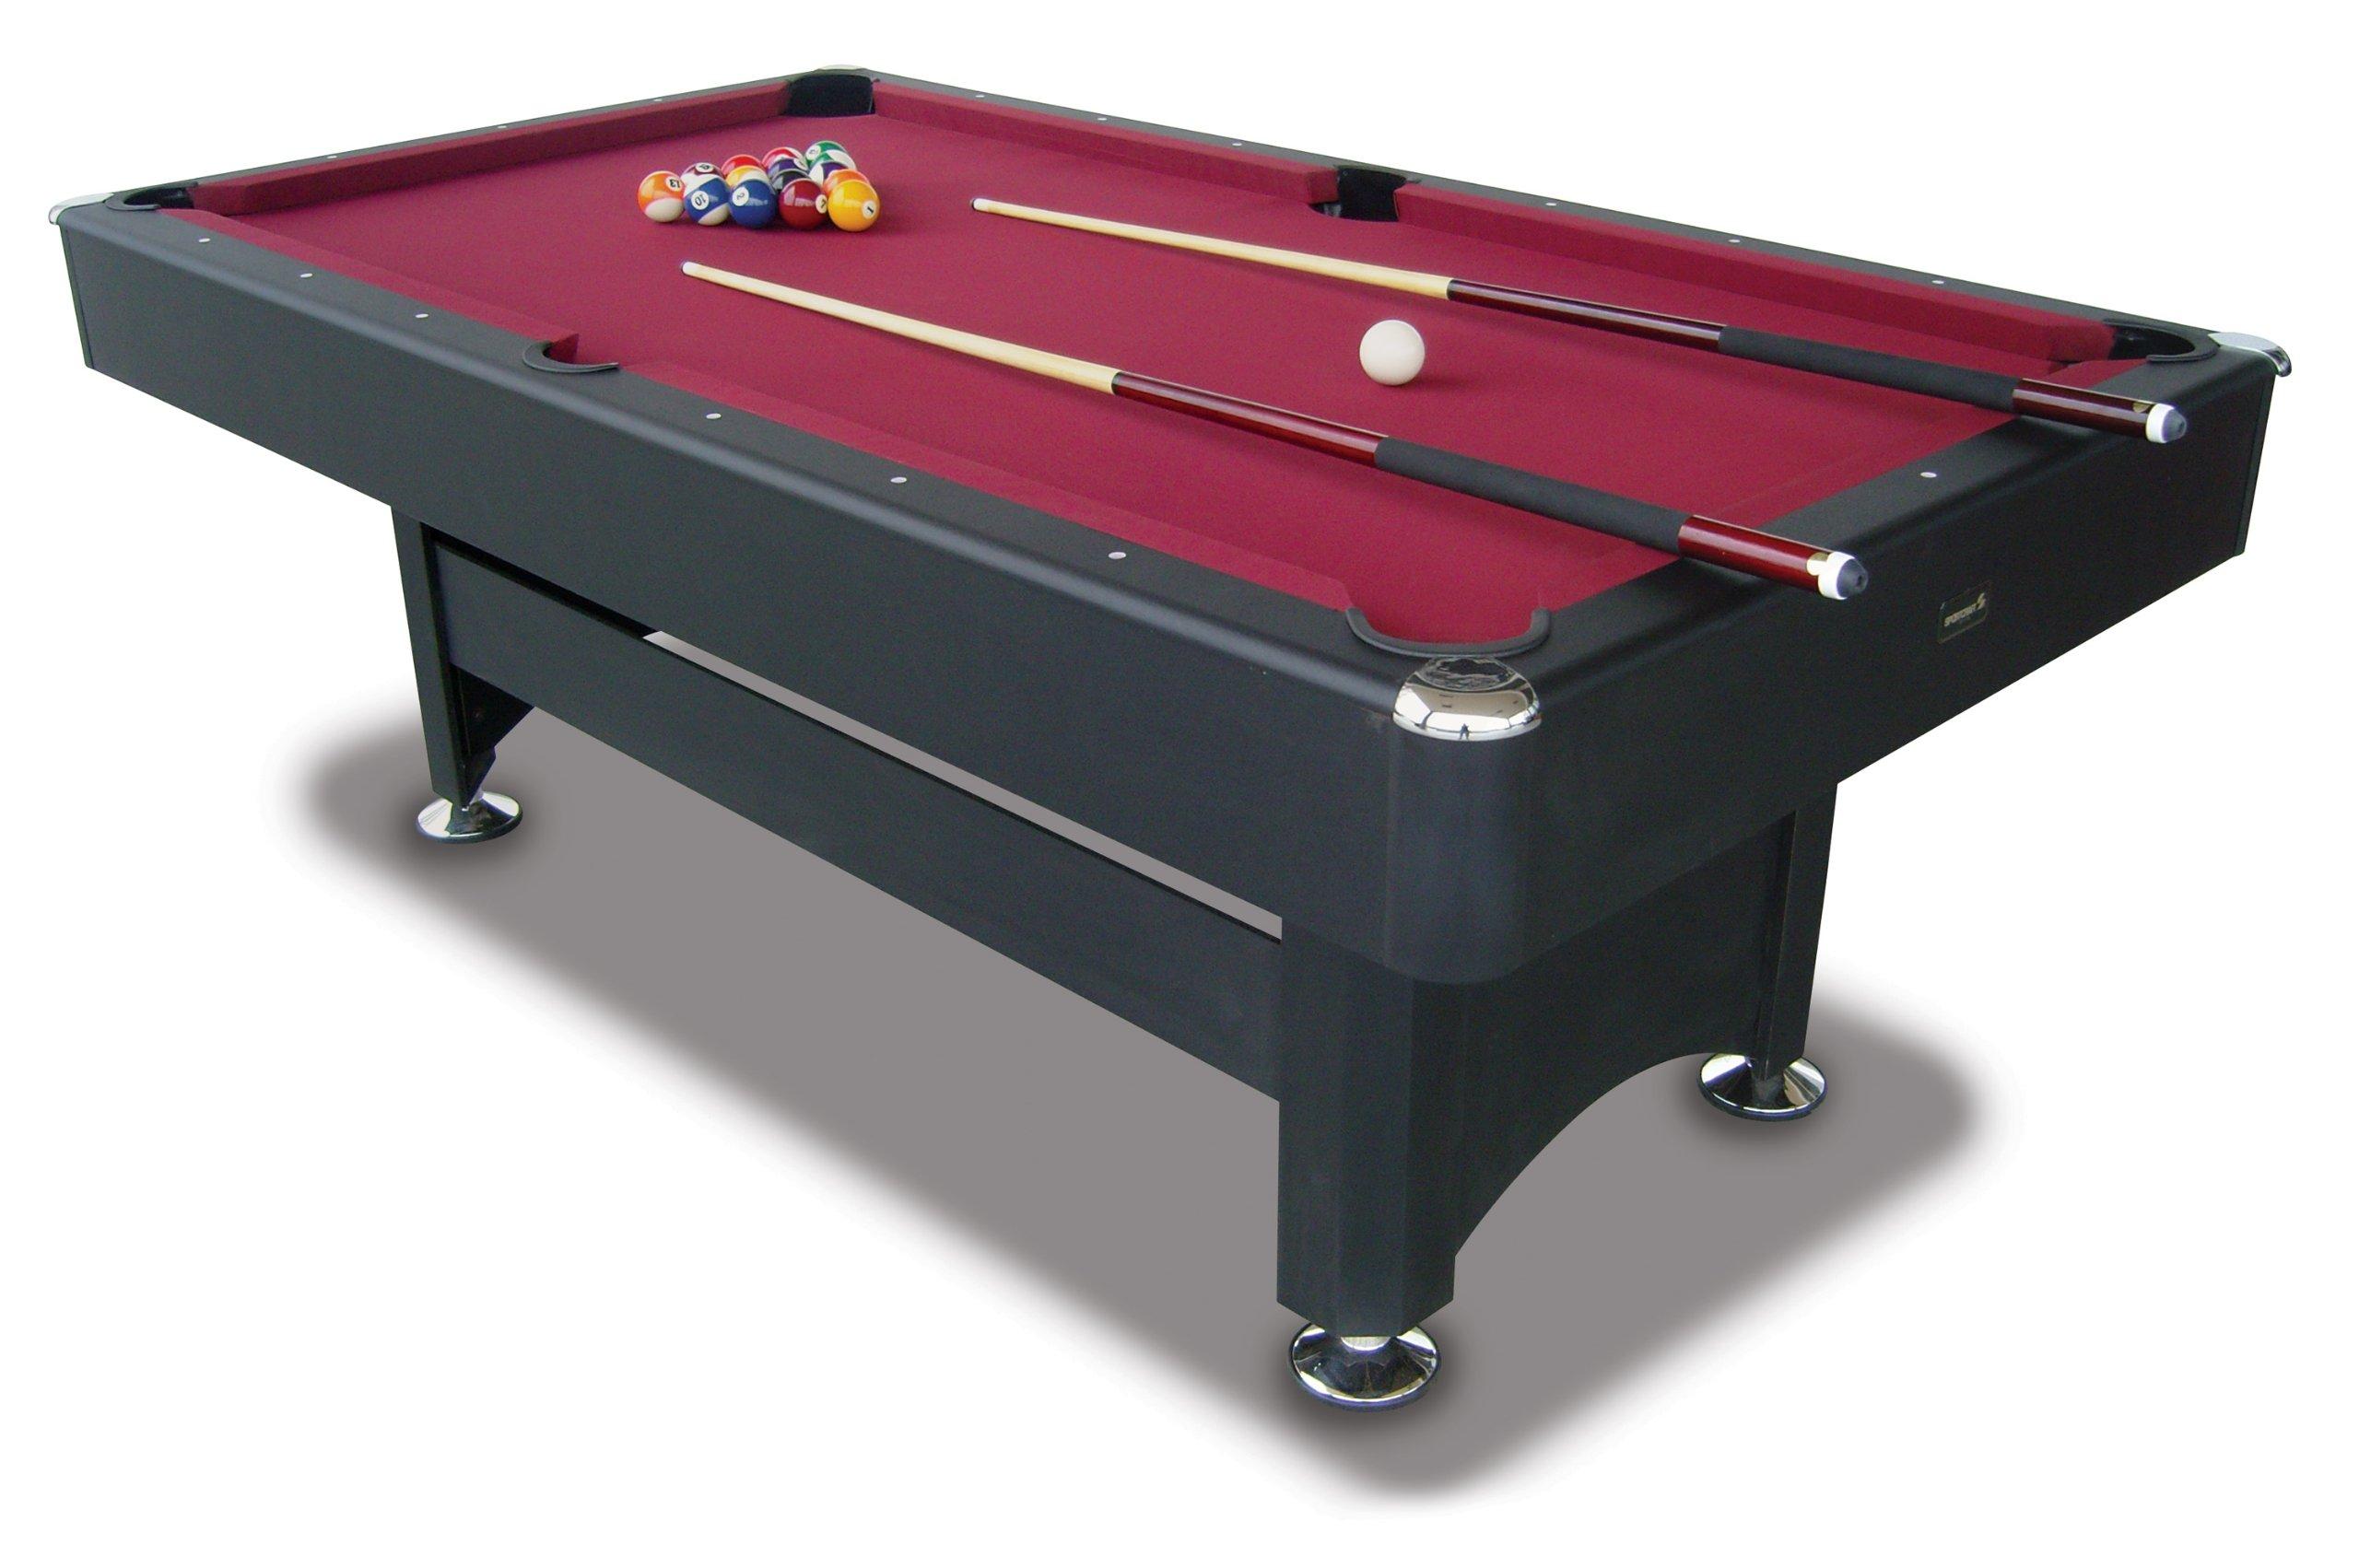 Cheap Sportcraft Billiard Find Sportcraft Billiard Deals On Line At - Sportcraft 3 in 1 pool table